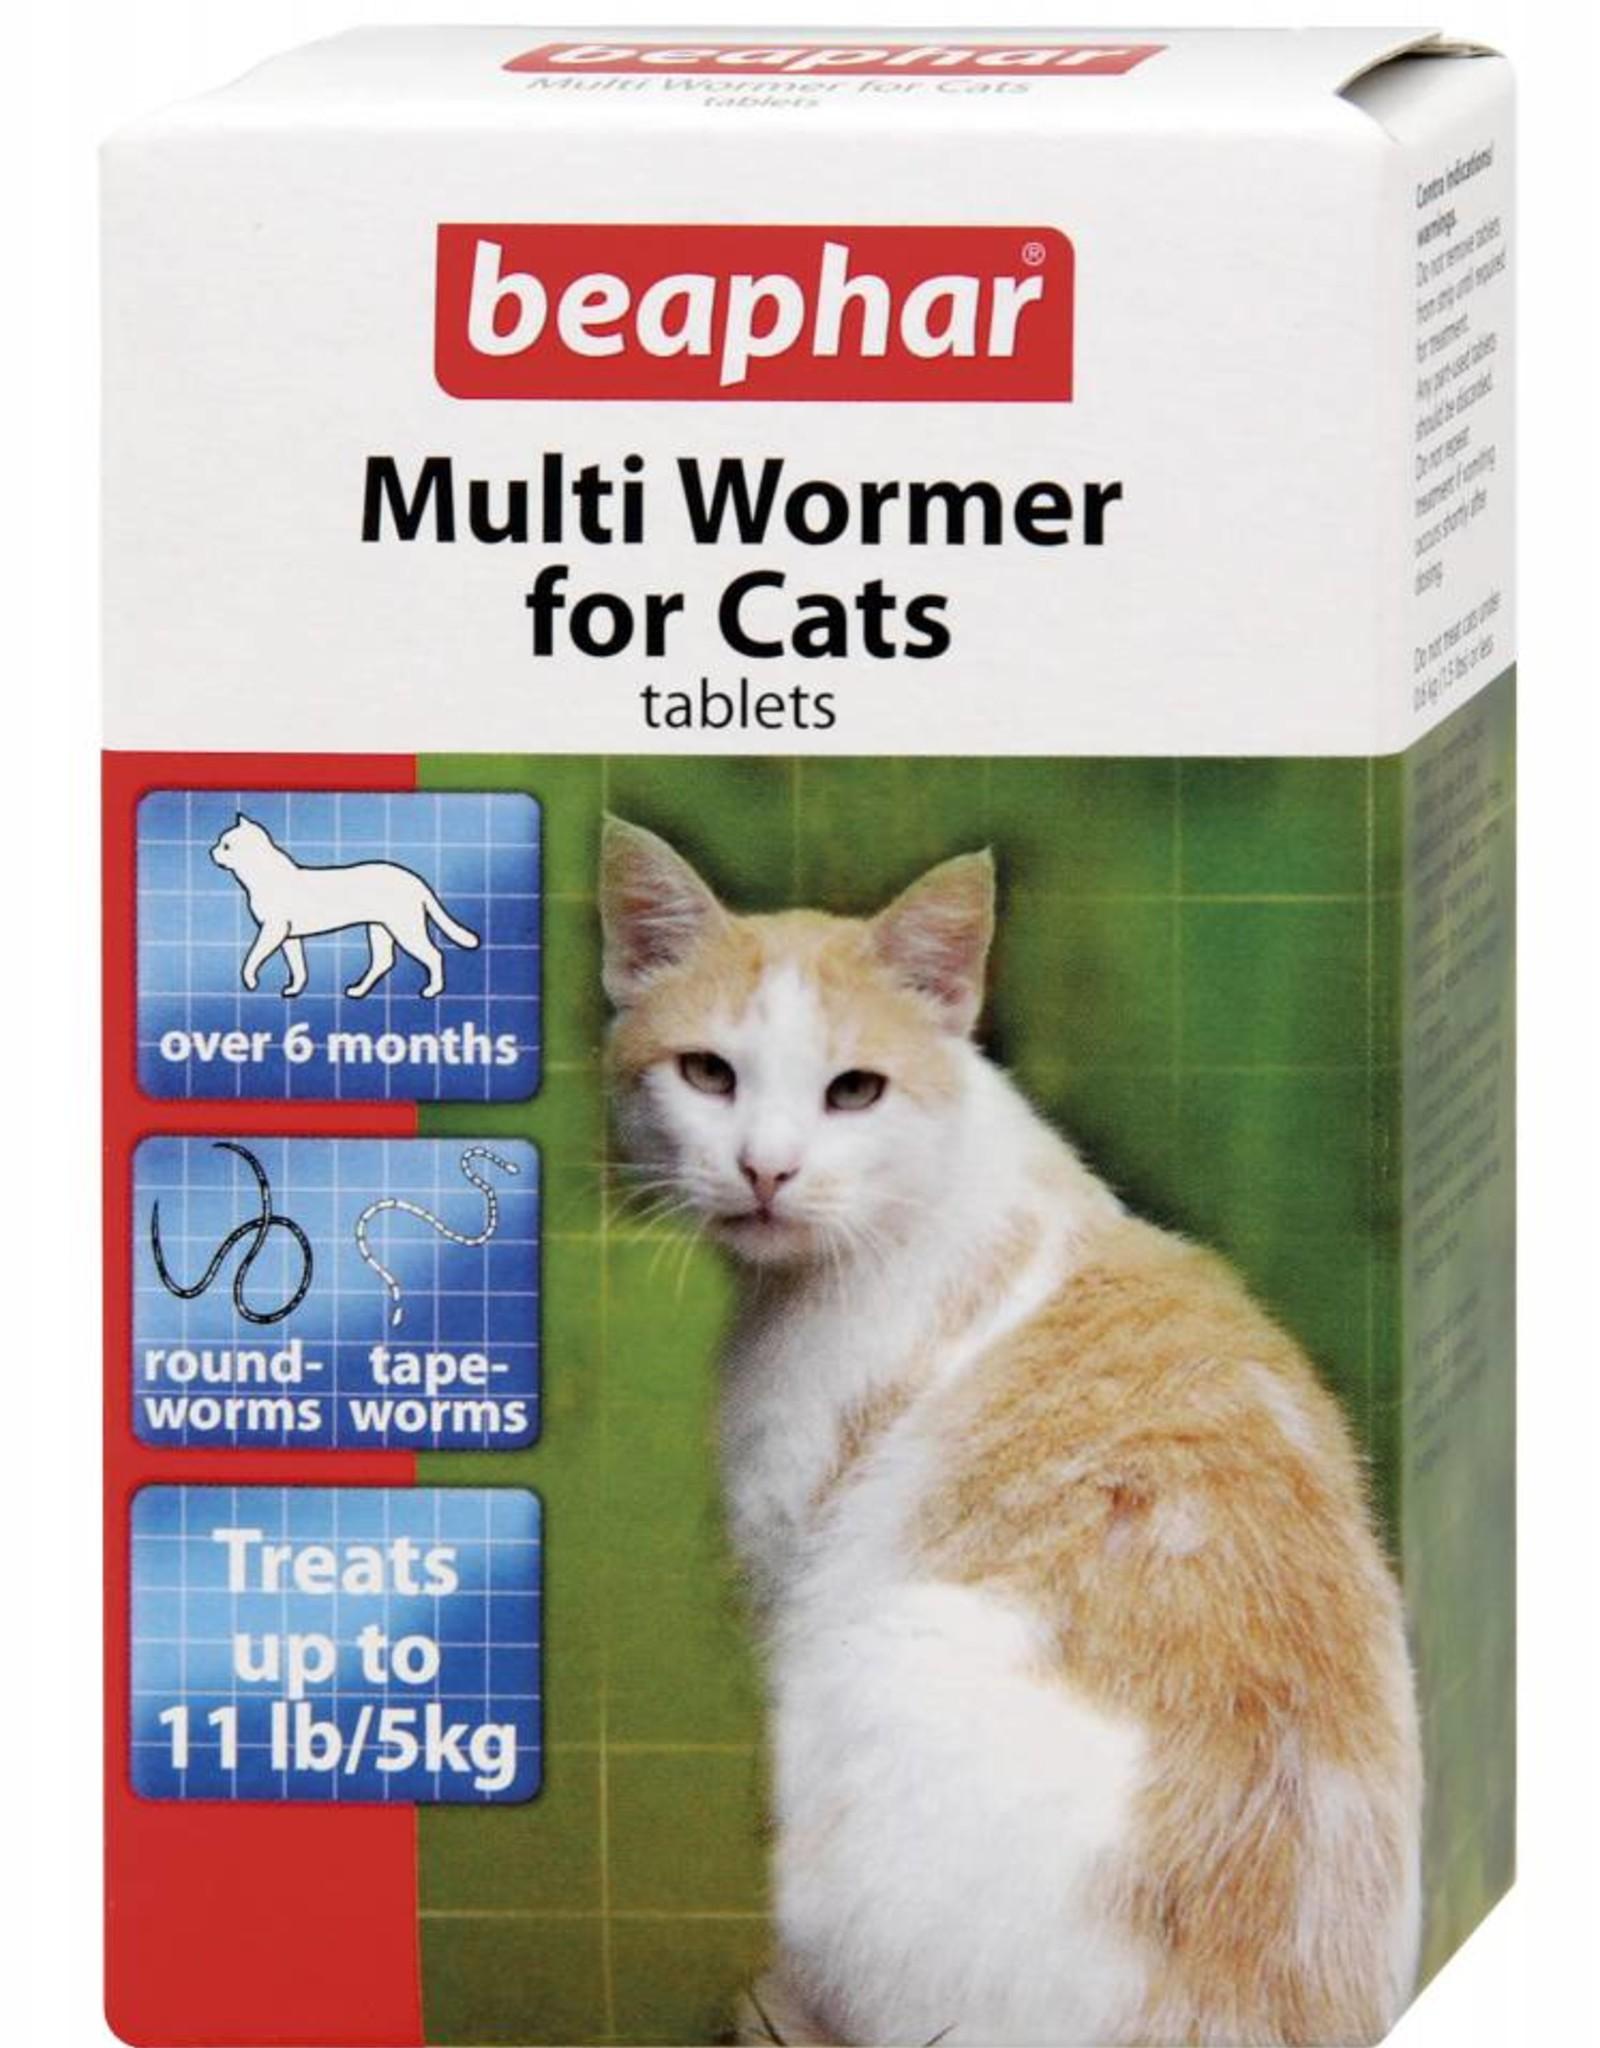 Beaphar Multi Wormer for Cats, 12 Tablets